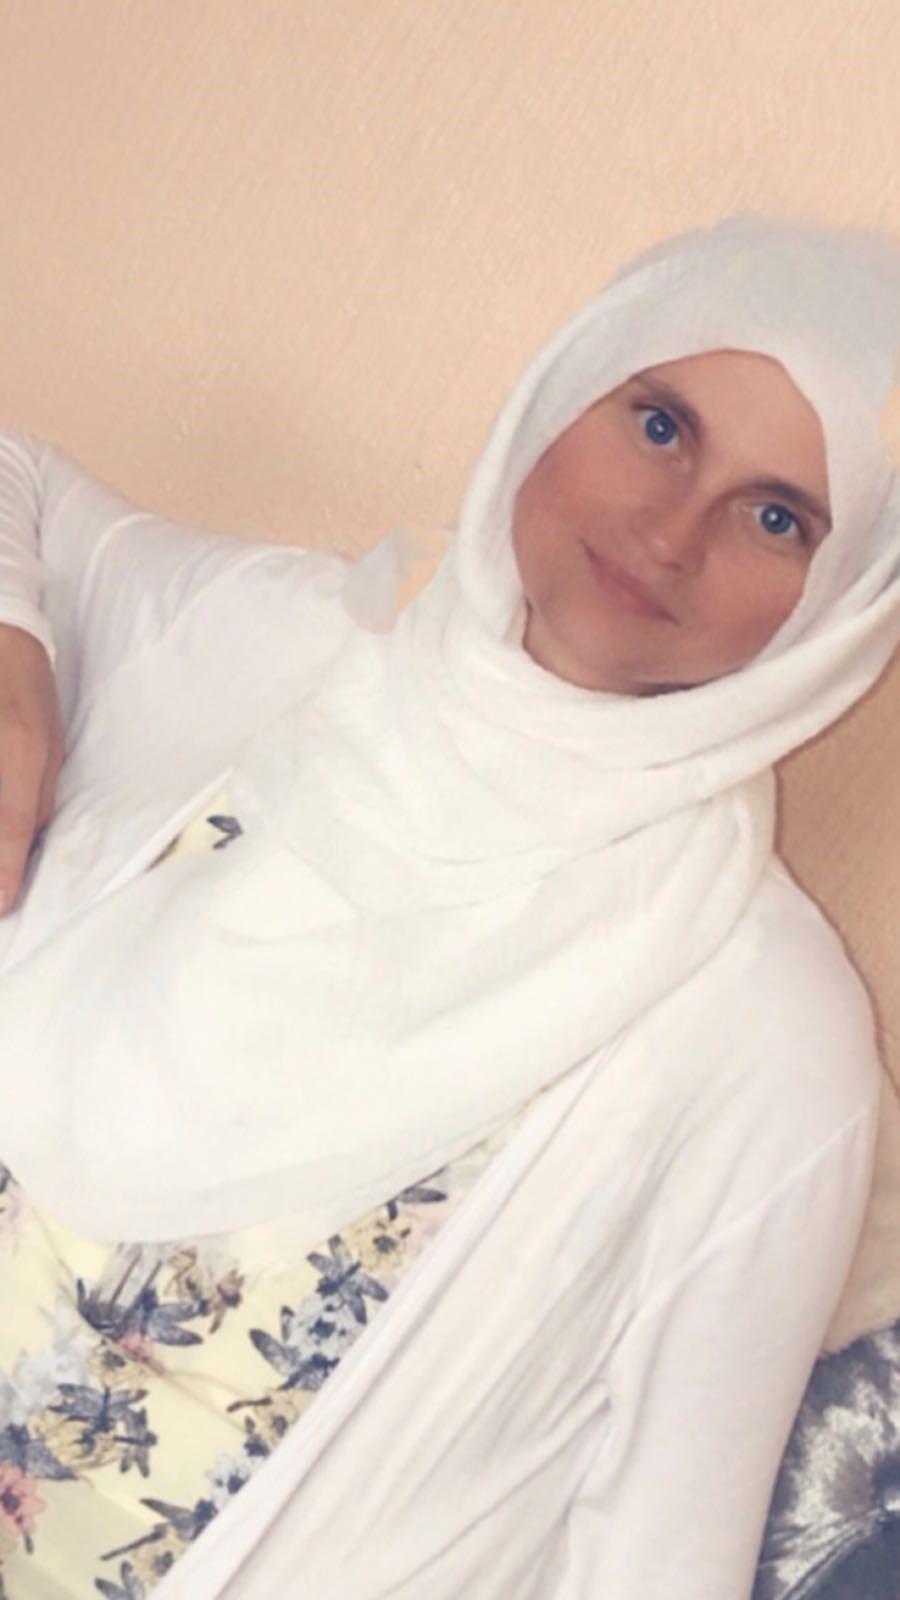 Ayishah Swiecinska